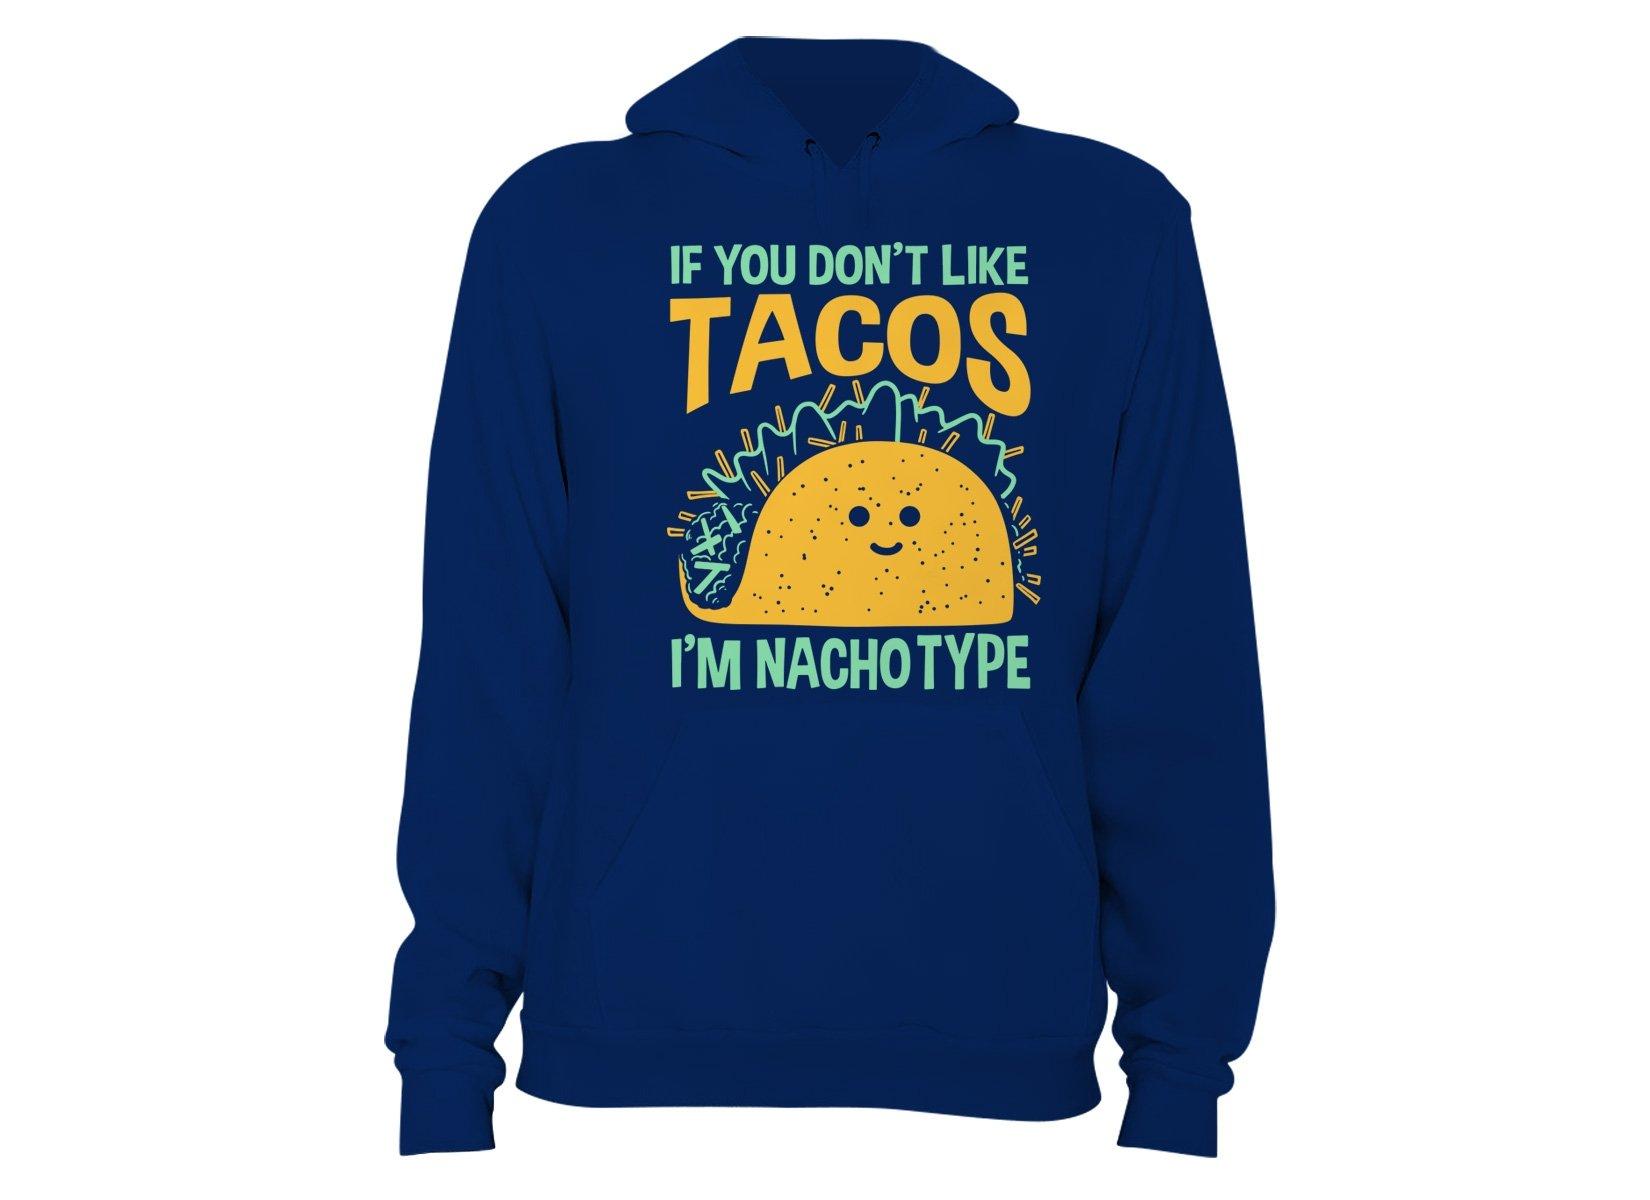 I'm Nacho Type on Hoodie